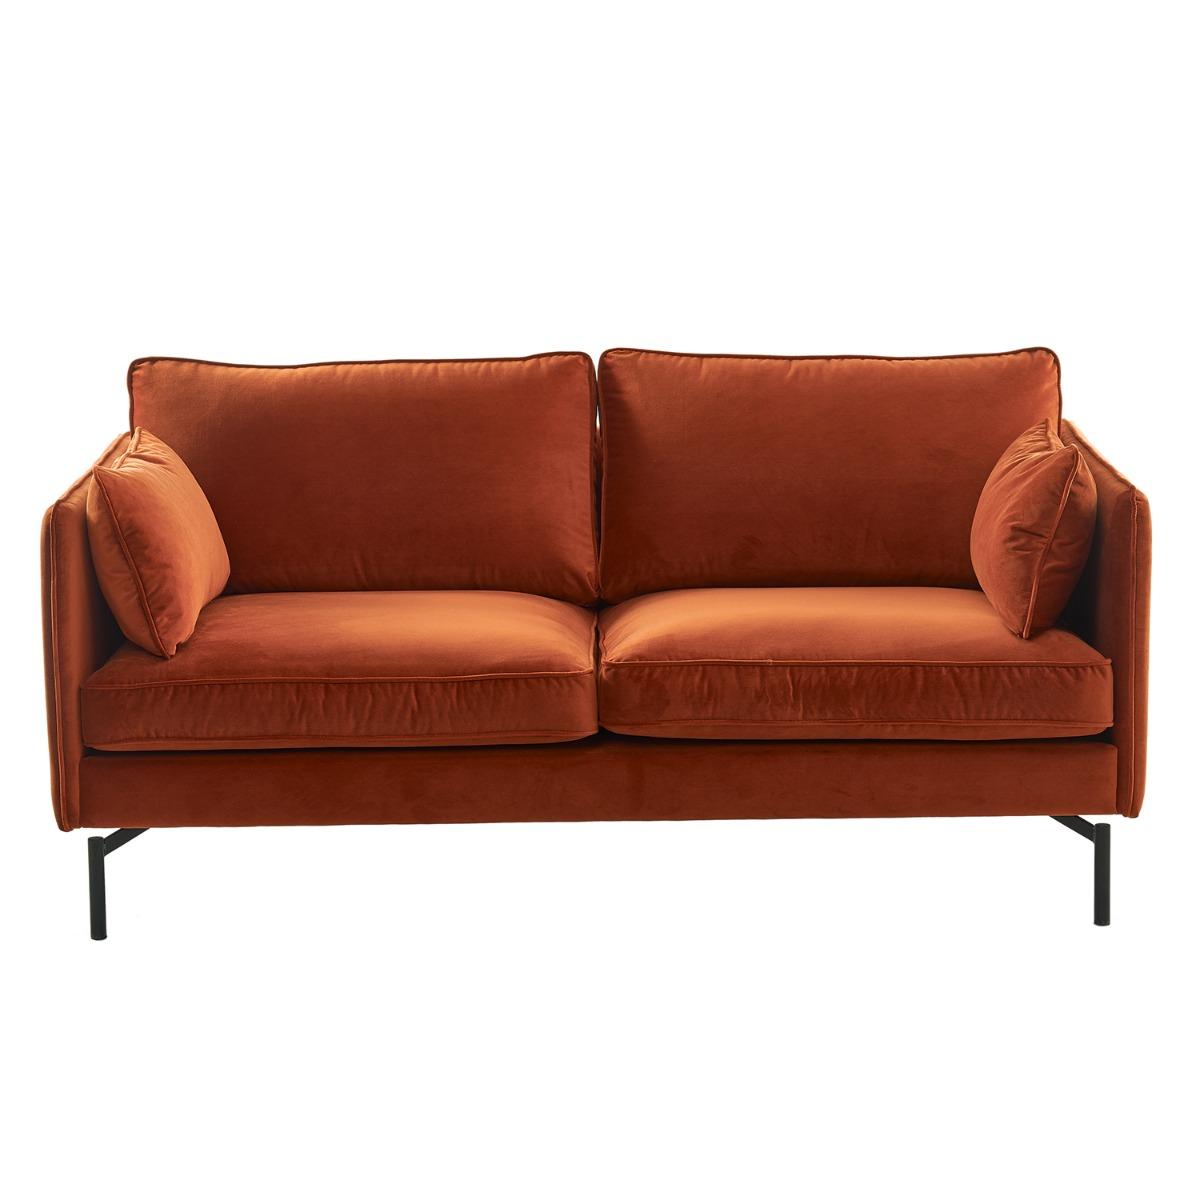 PPno.2 sofa Pols Potten roest rood